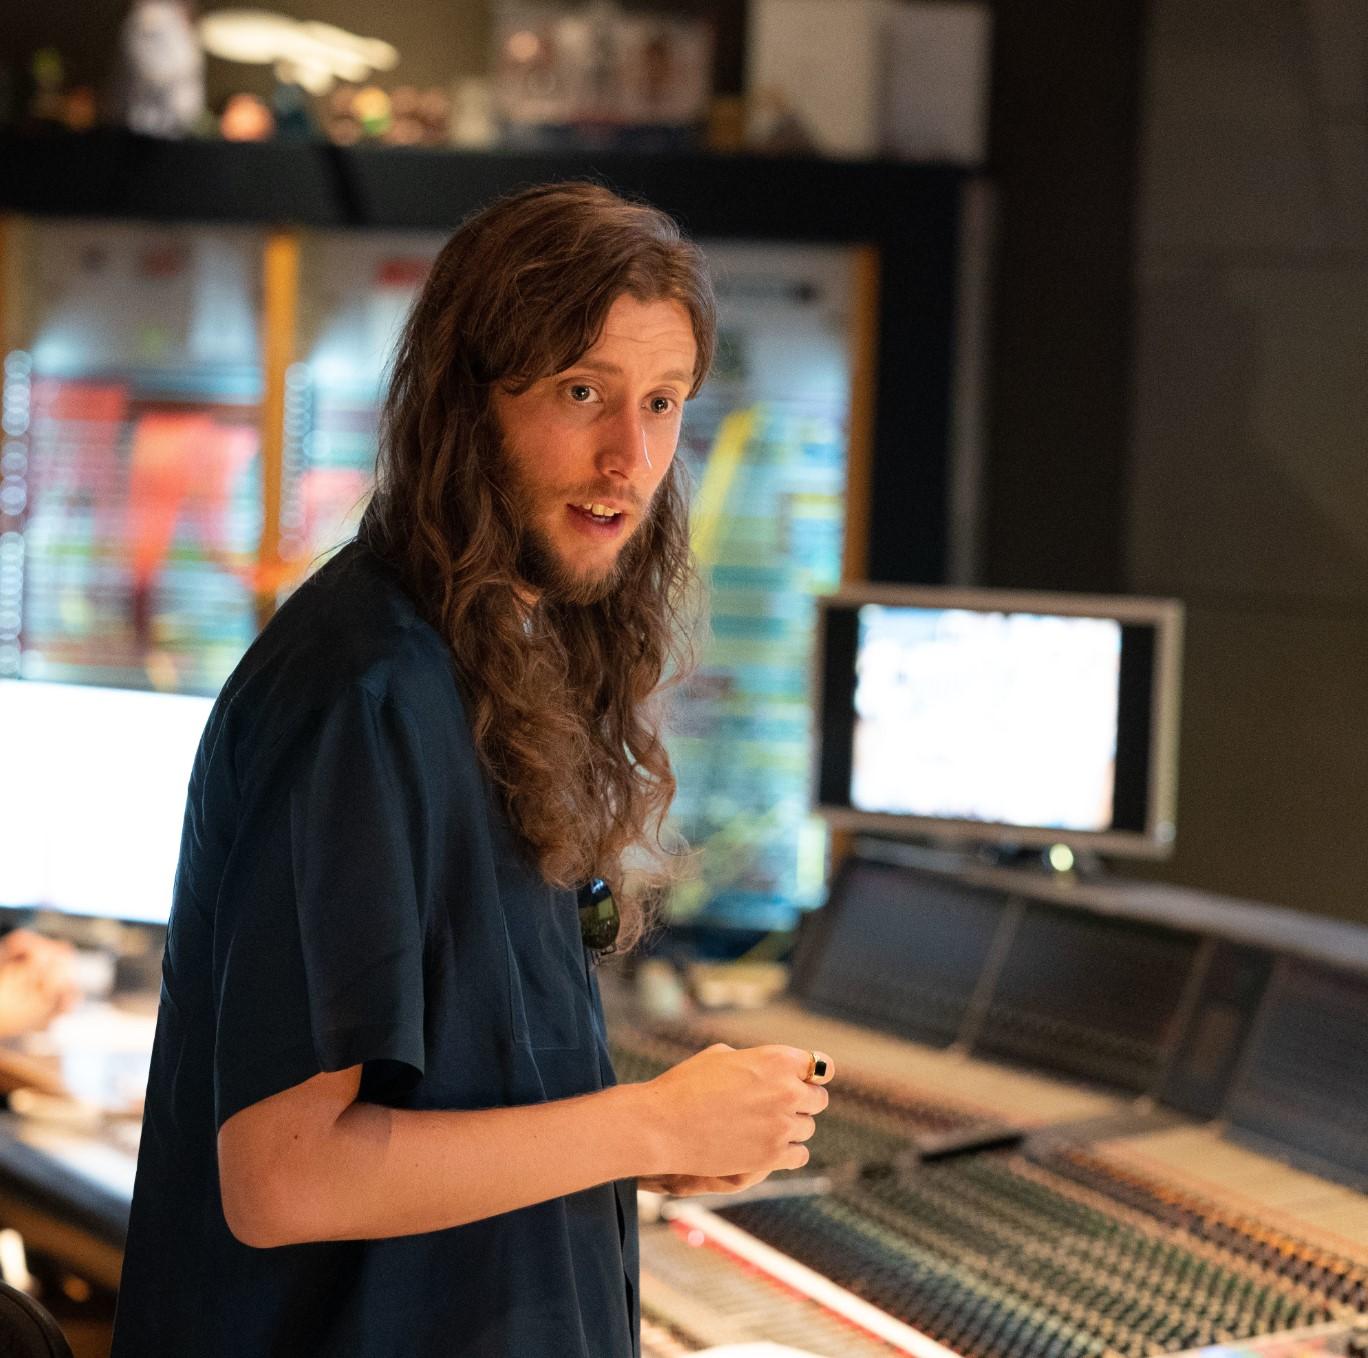 Mandalorian Composer Releases Station On Sonos Radio